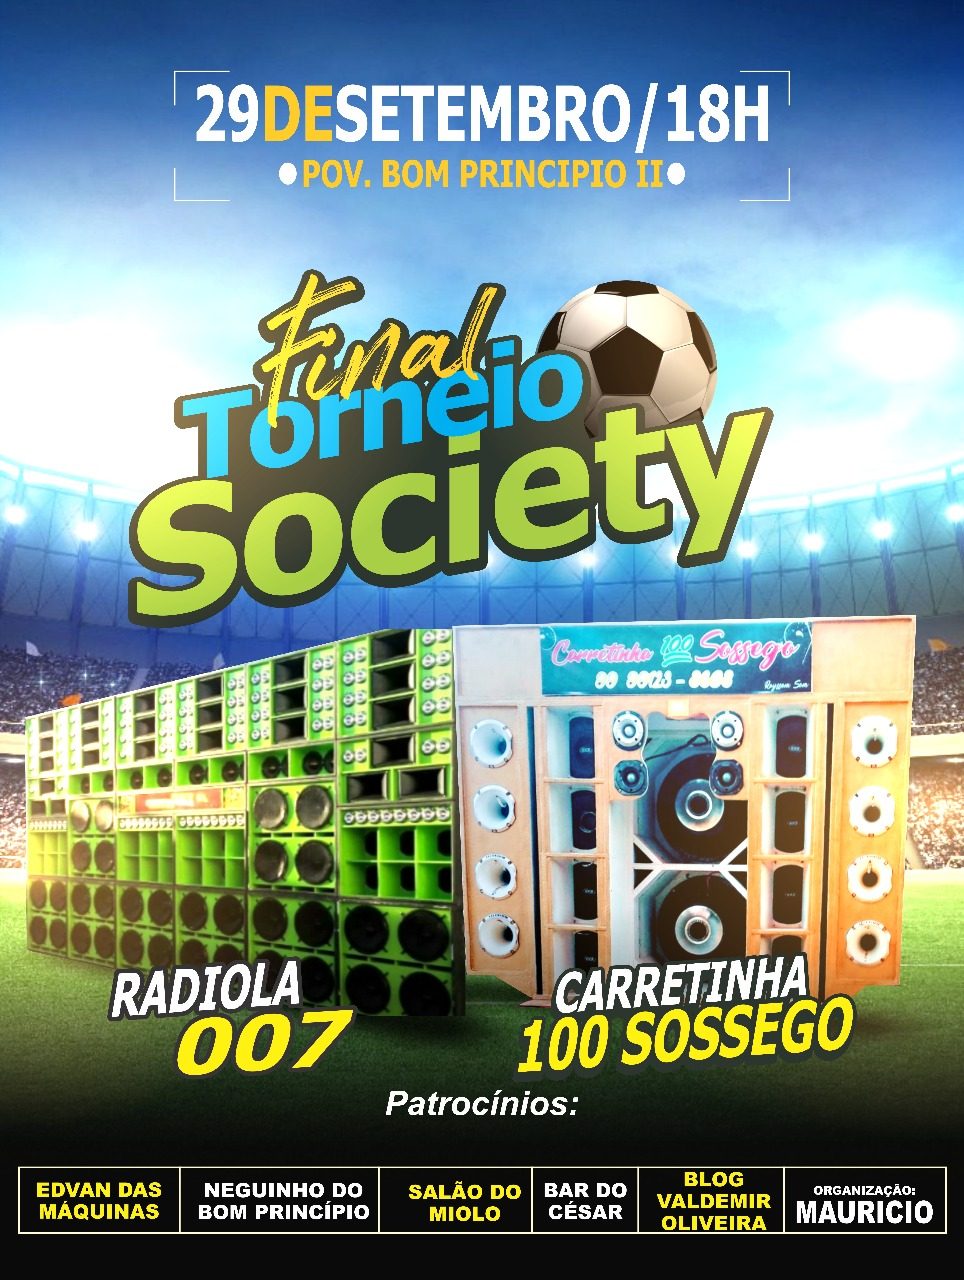 FINAL TORNEIO SOCIETY